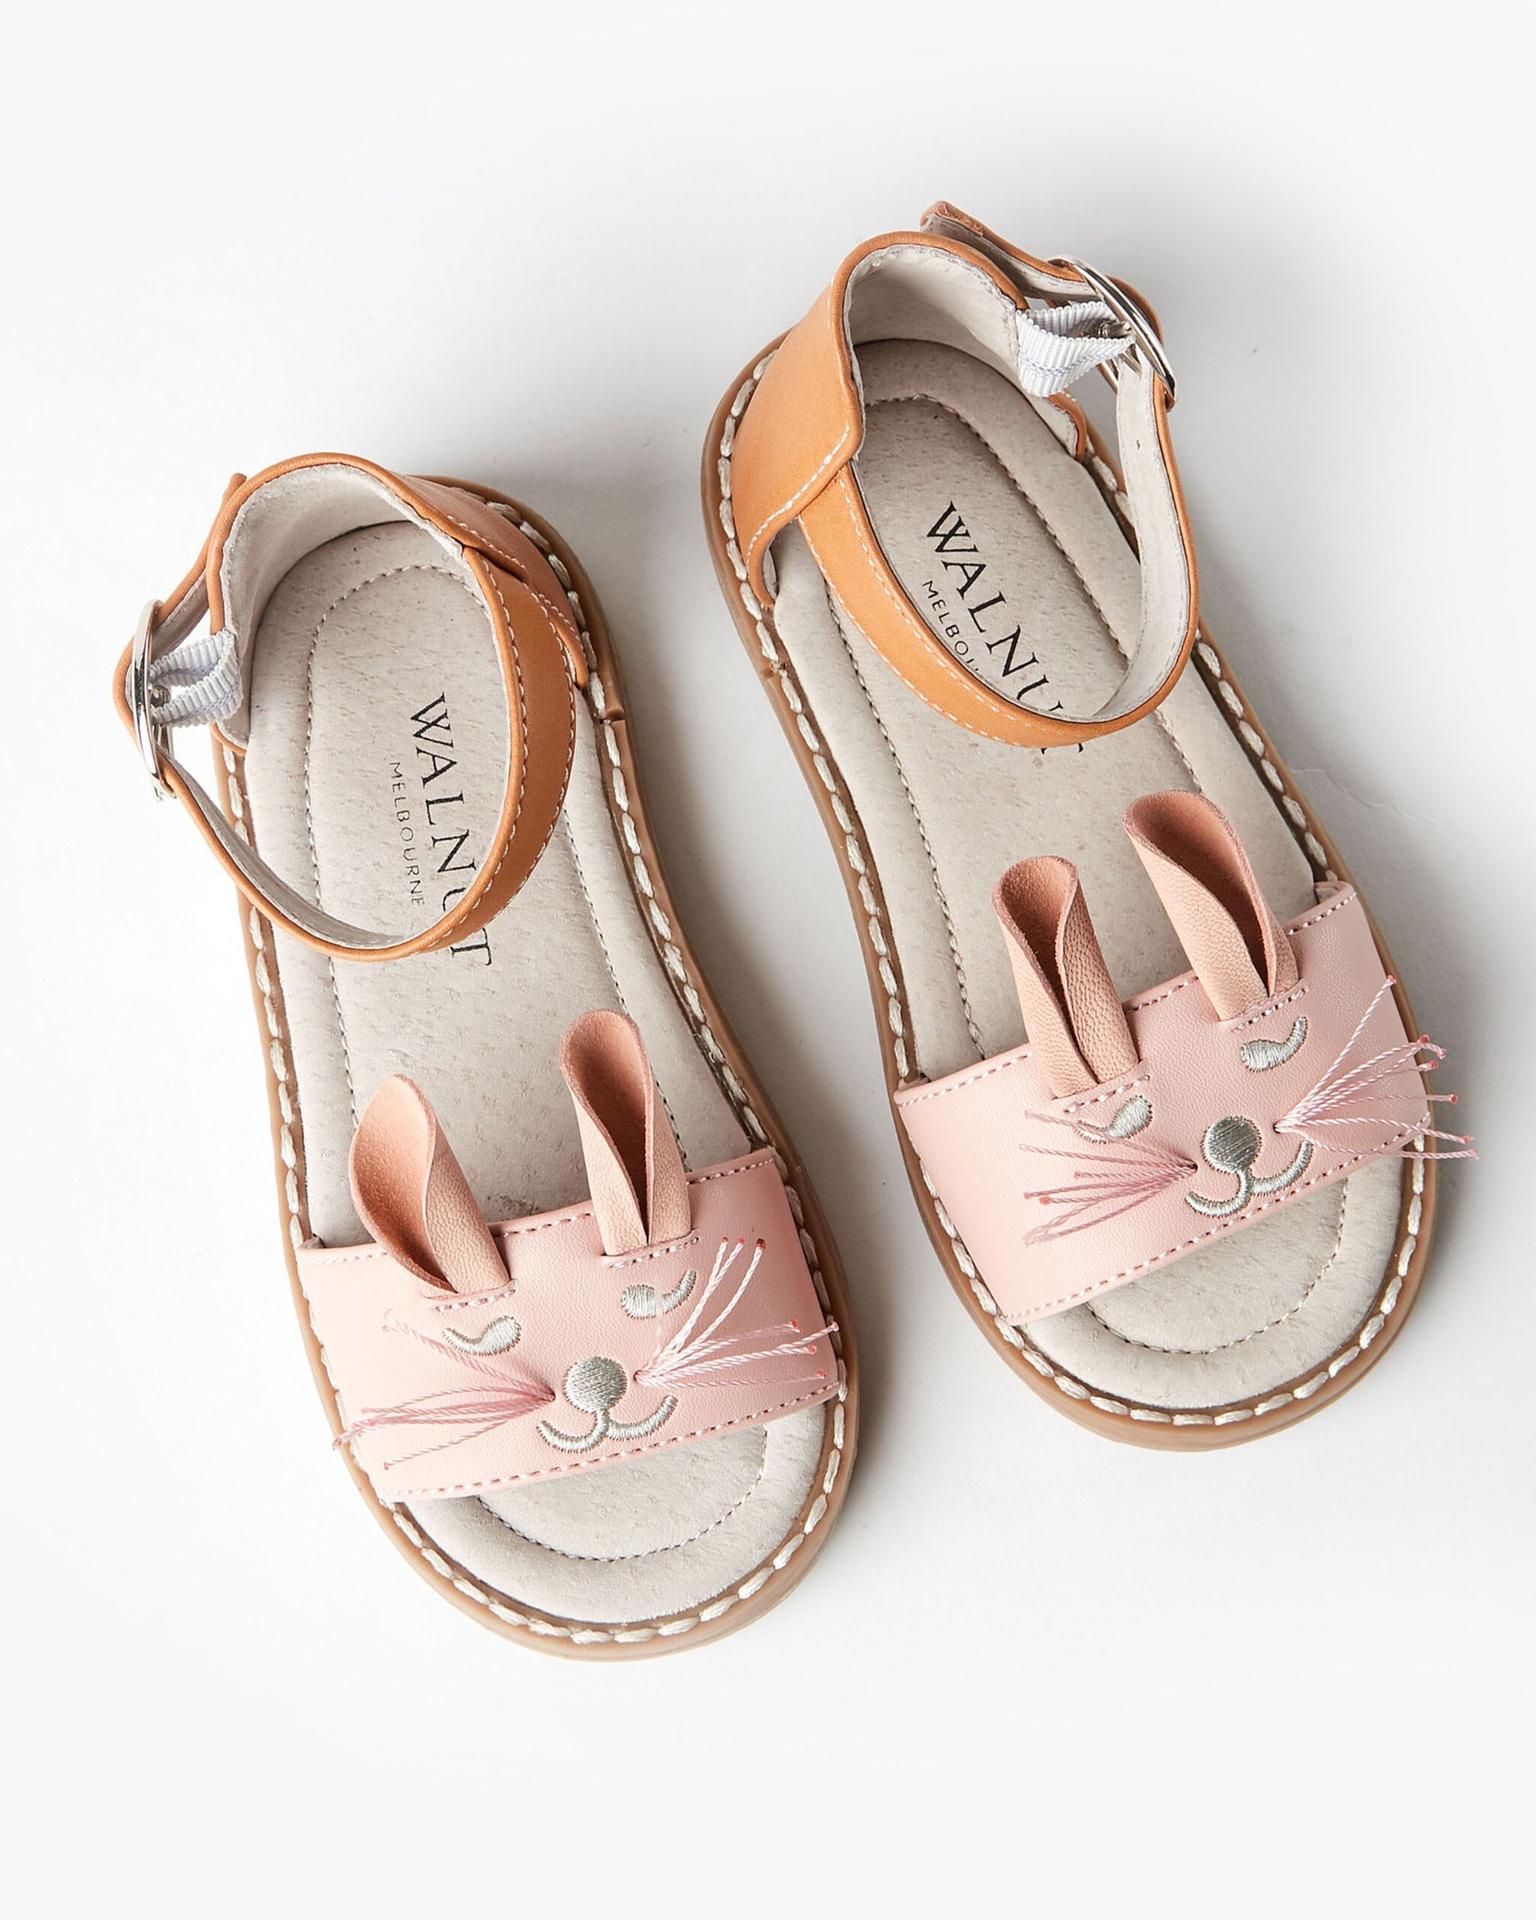 Walnut Bunny Emb Sandal Pink Combo